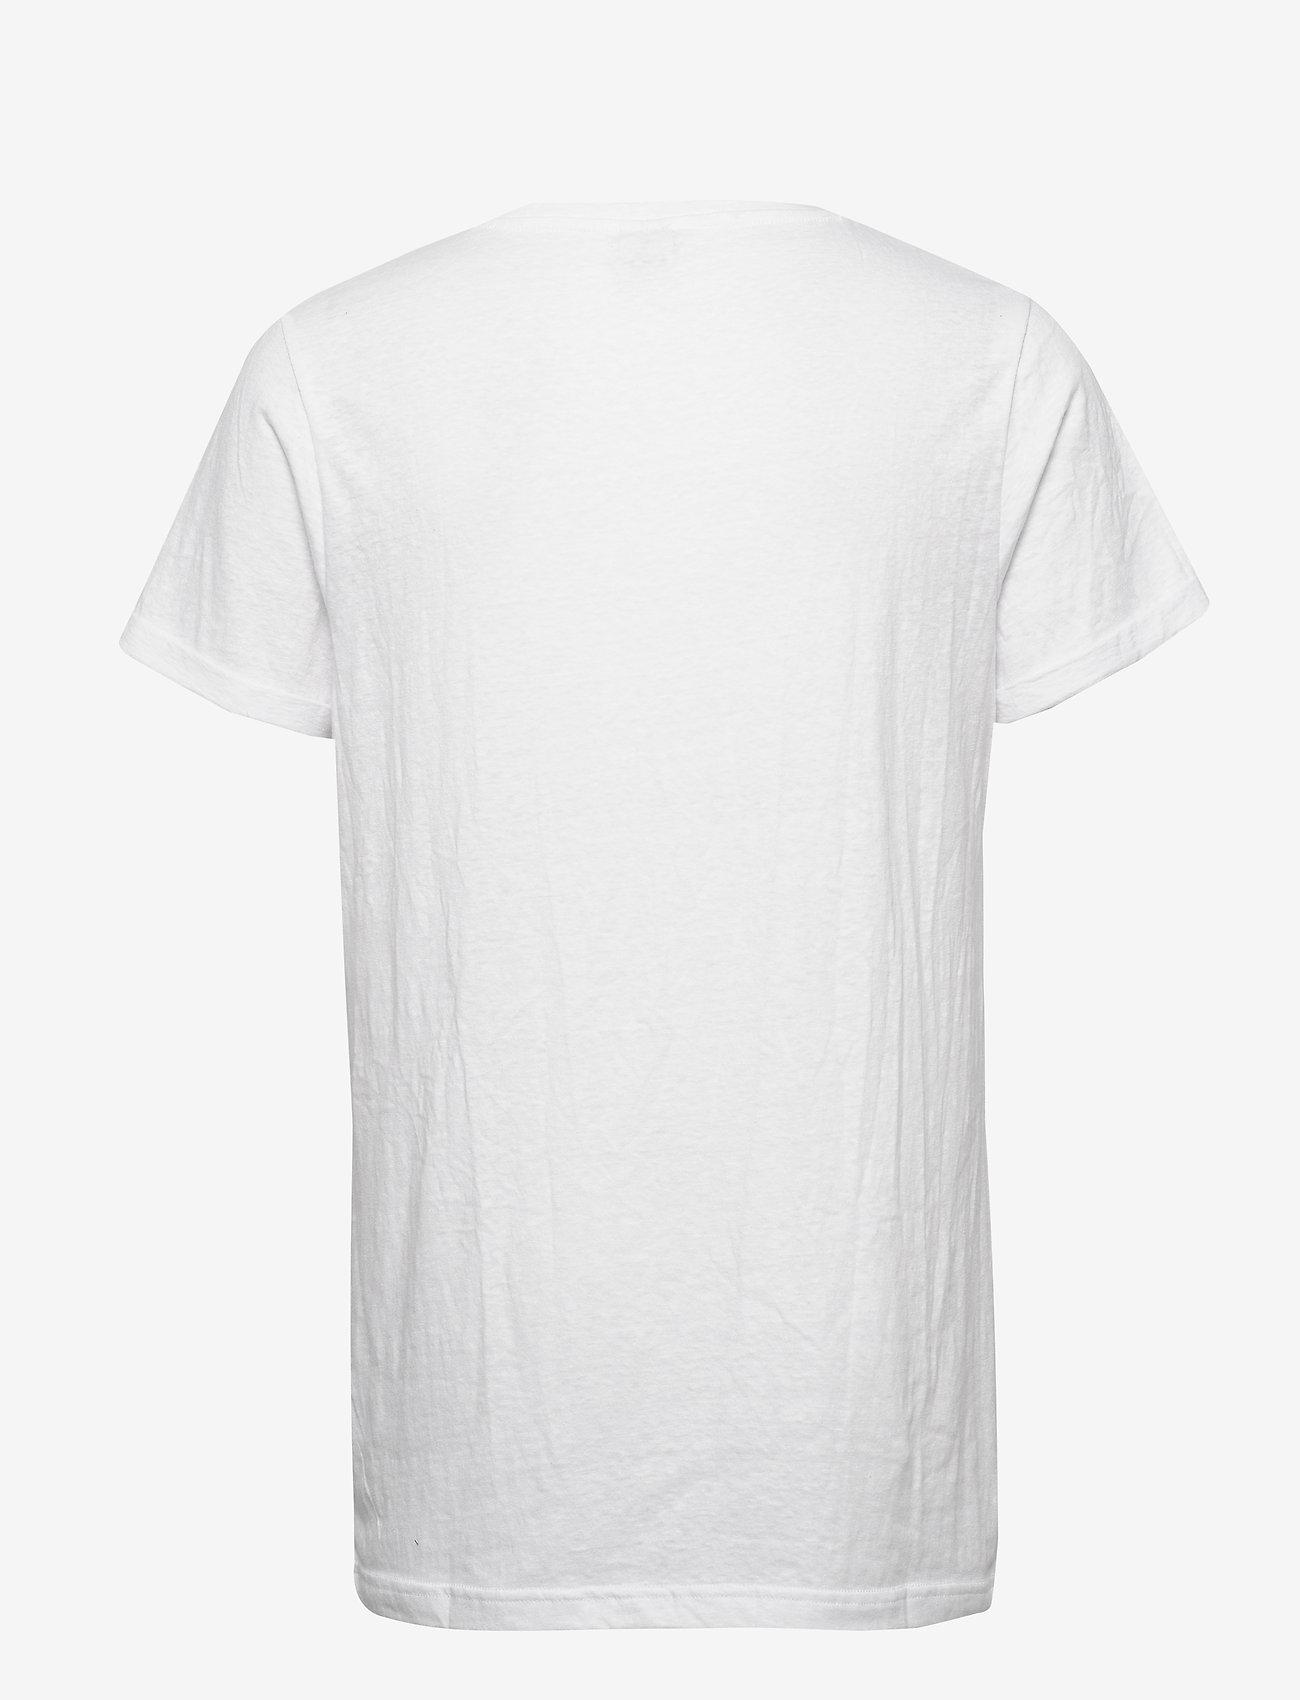 Bula - Foam Tee - oberteile & t-shirts - white - 1